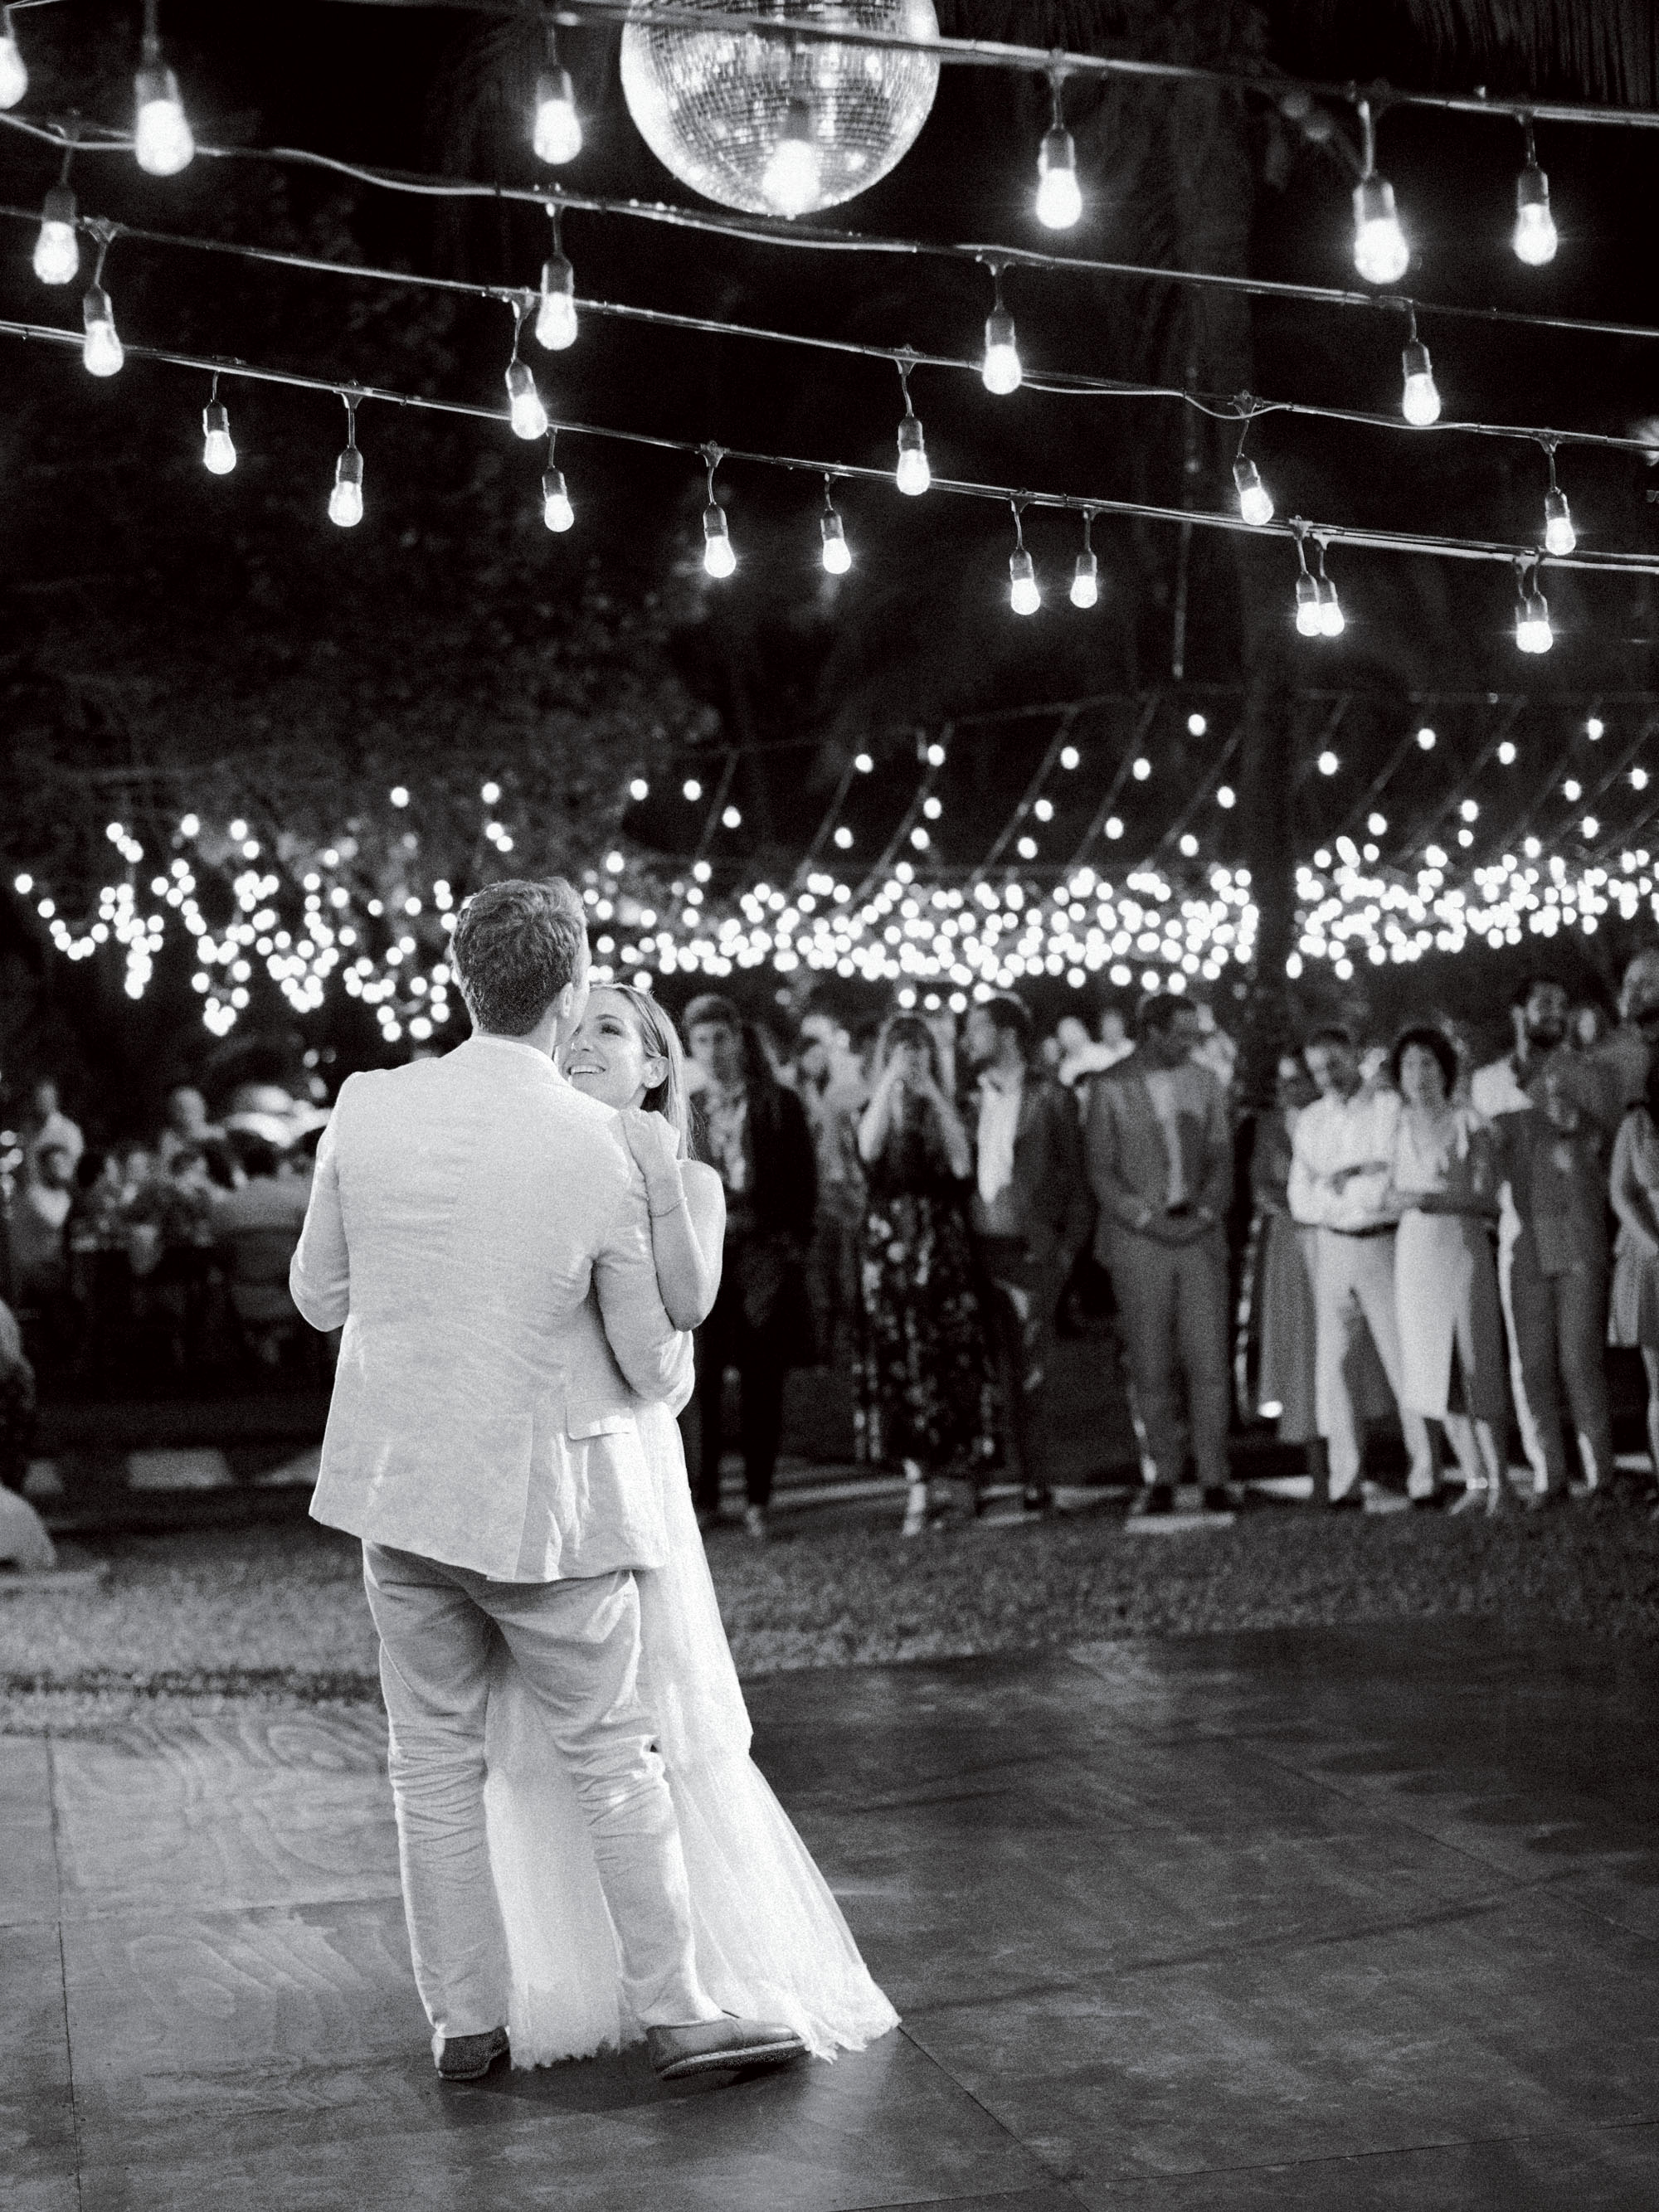 ariel trevor wedding tulum mexico first dance couple bride group lights